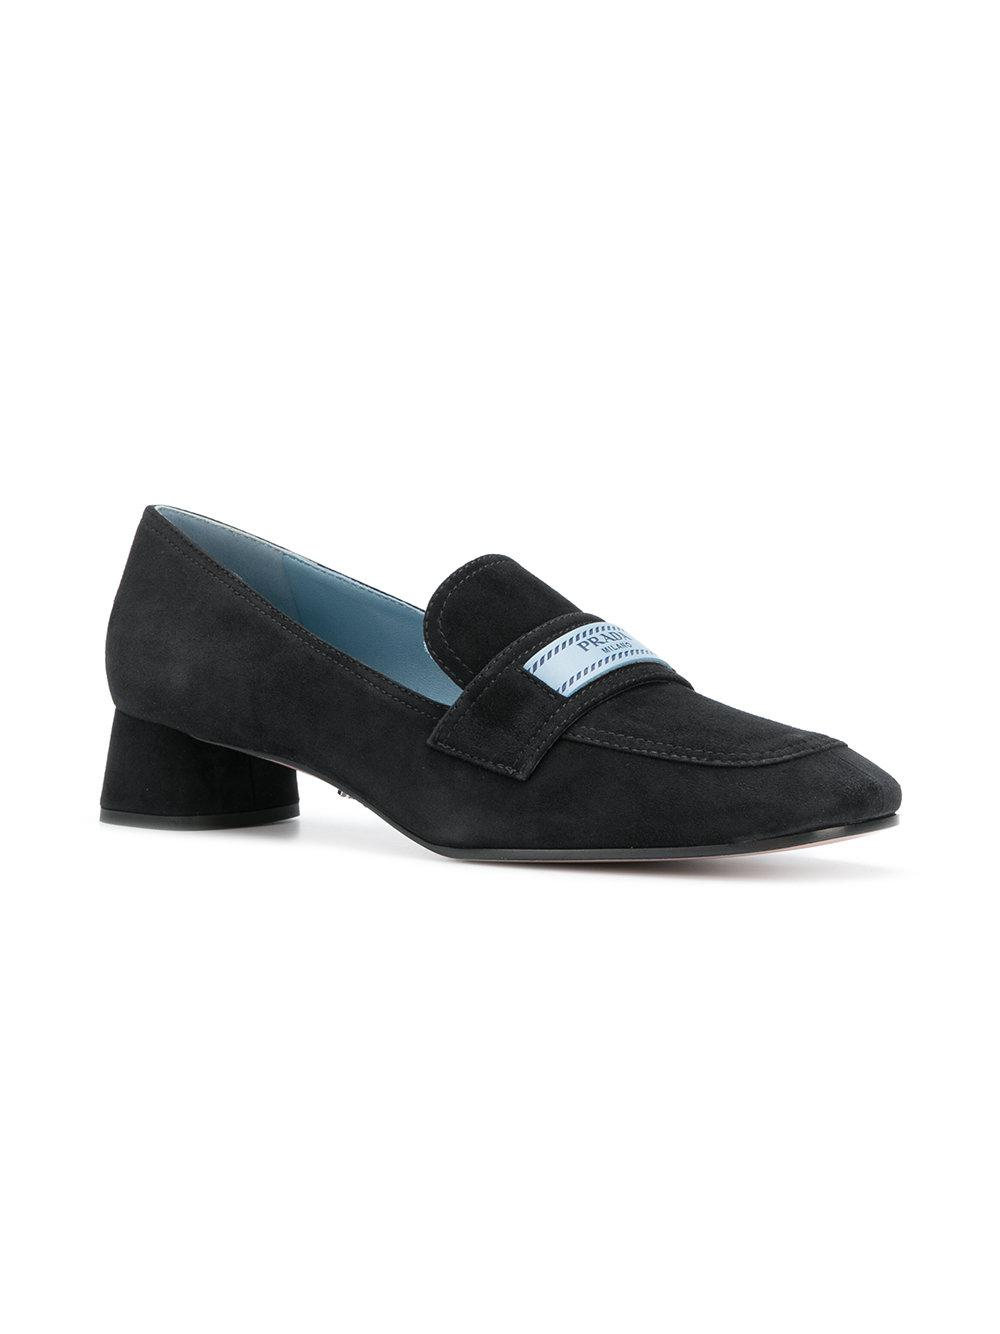 logo patch block heel loafers - Black Prada Discount Factory Outlet vqTUj0q6zN